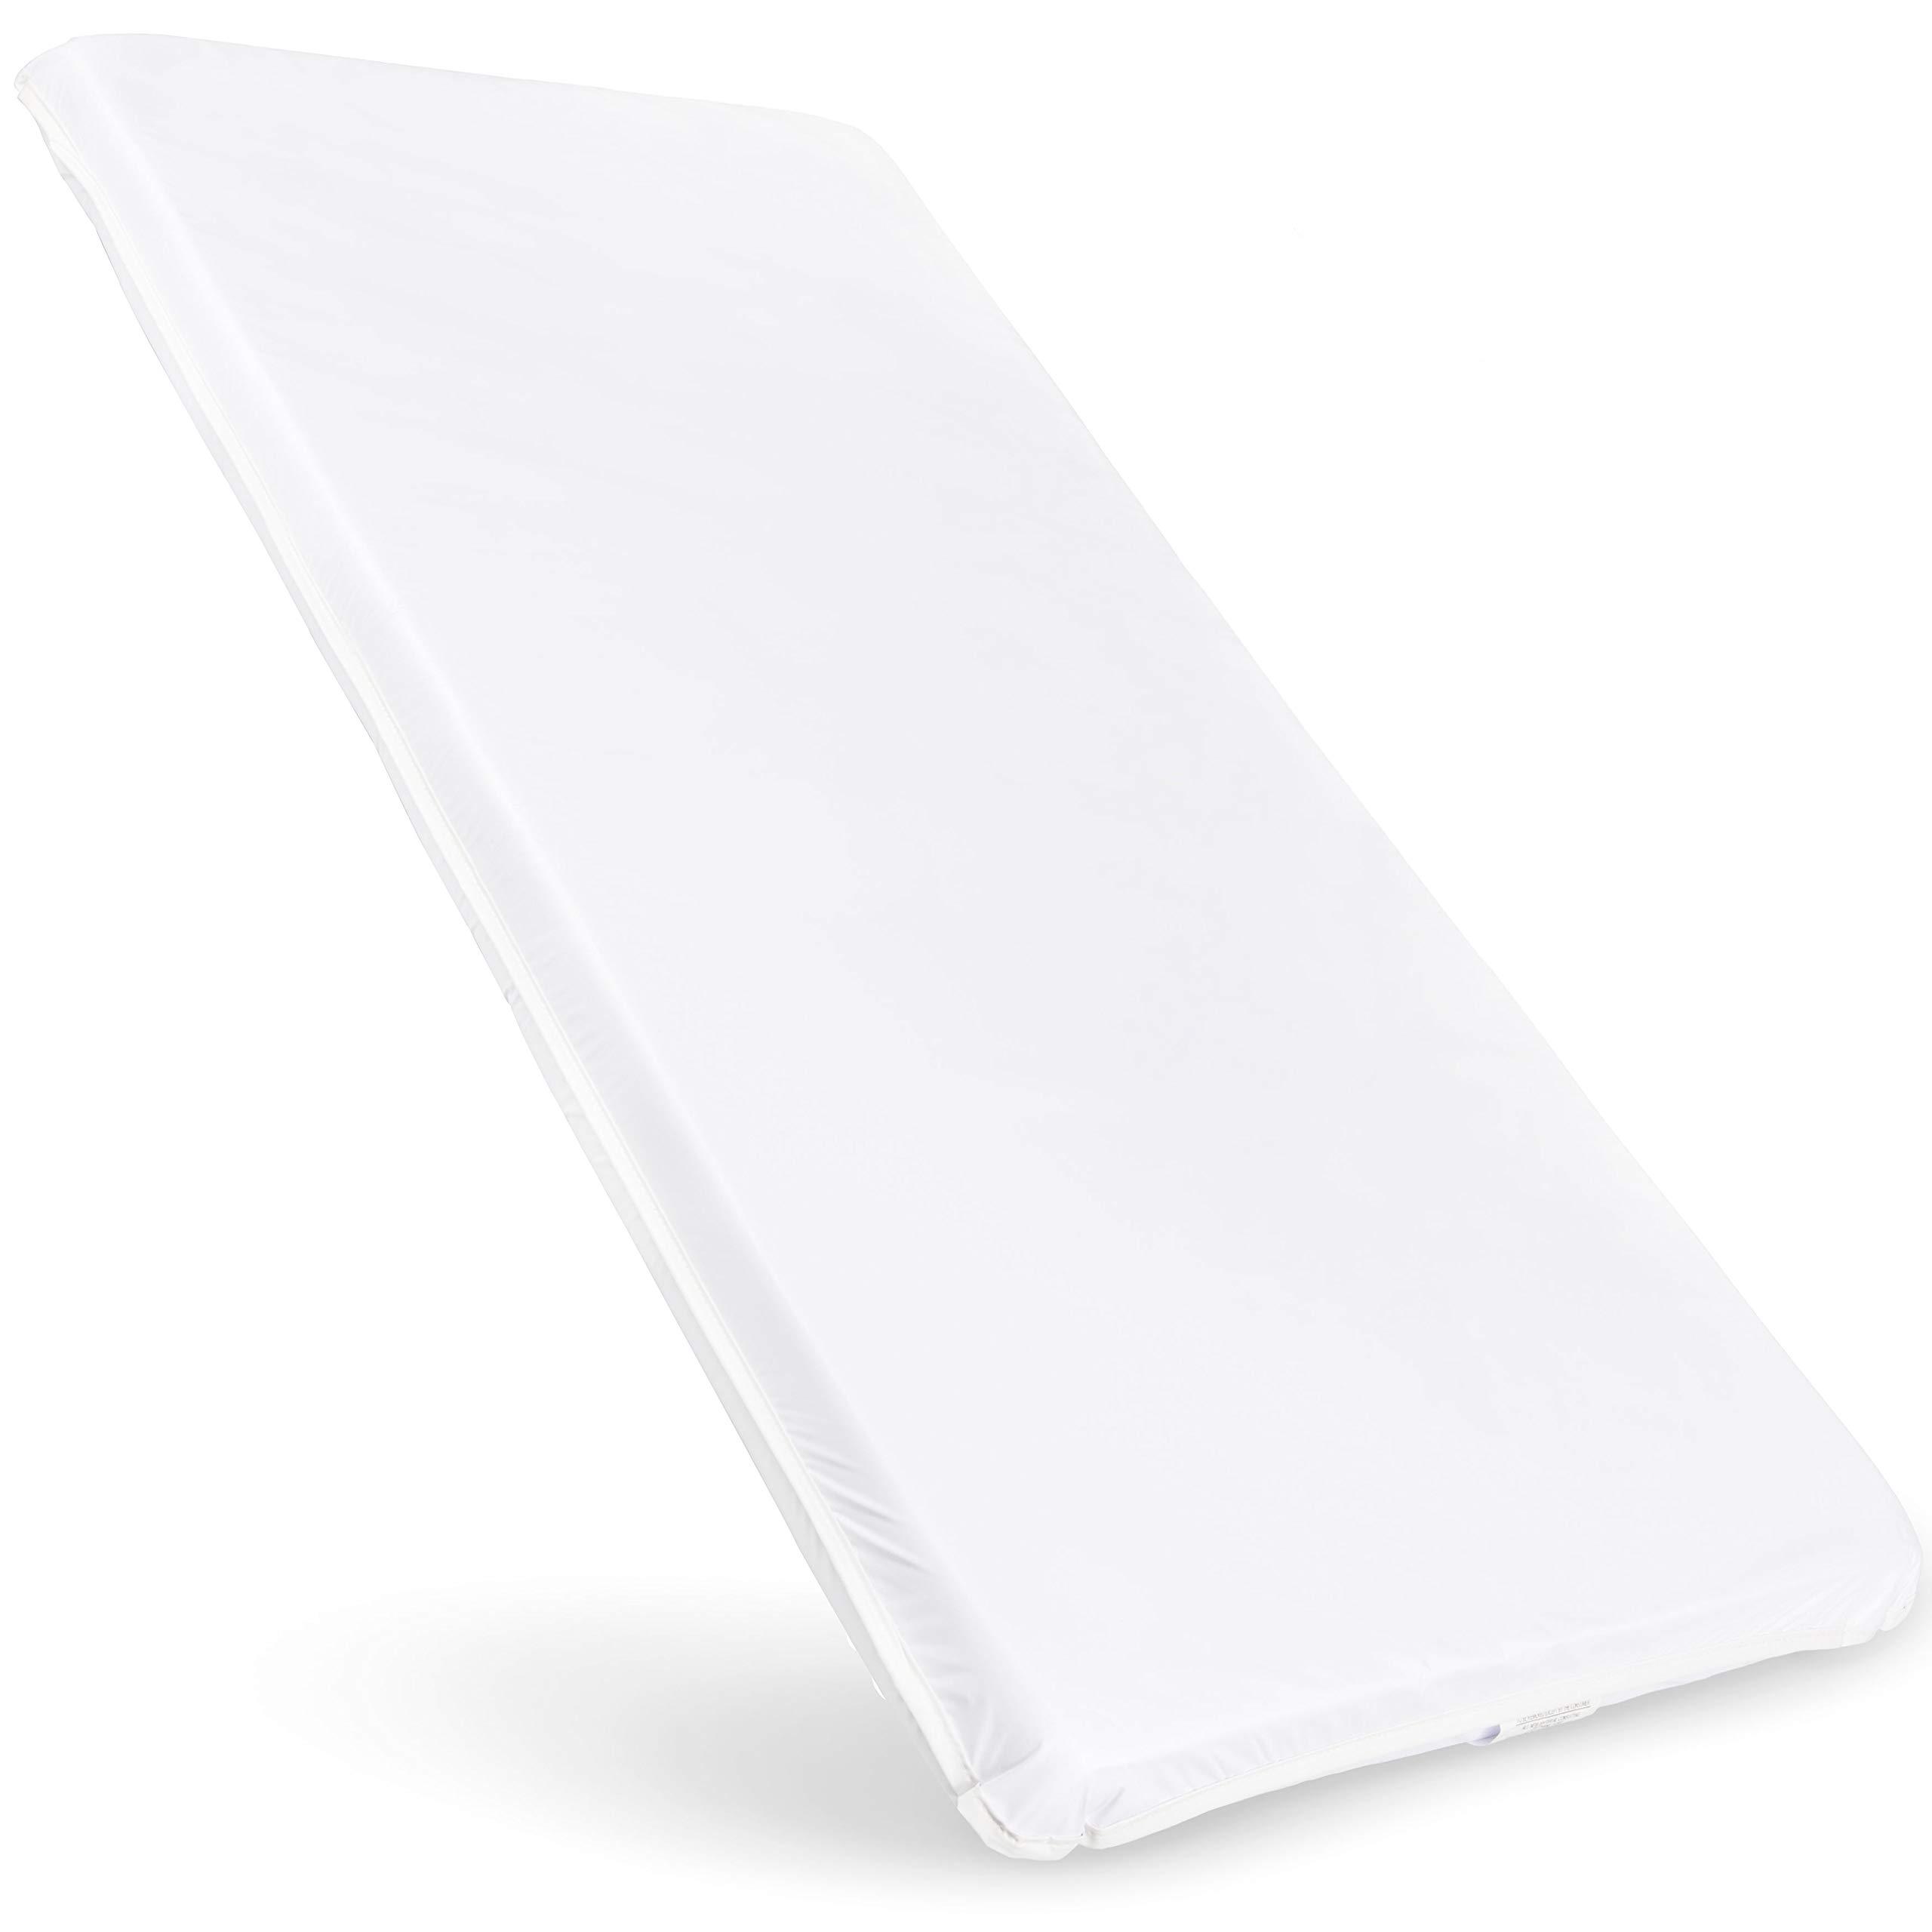 Custom Size Baby Crib Mattress Bed Pad: Firm Foam Bedding : Waterproof Vinyl Top by babykidsbargains